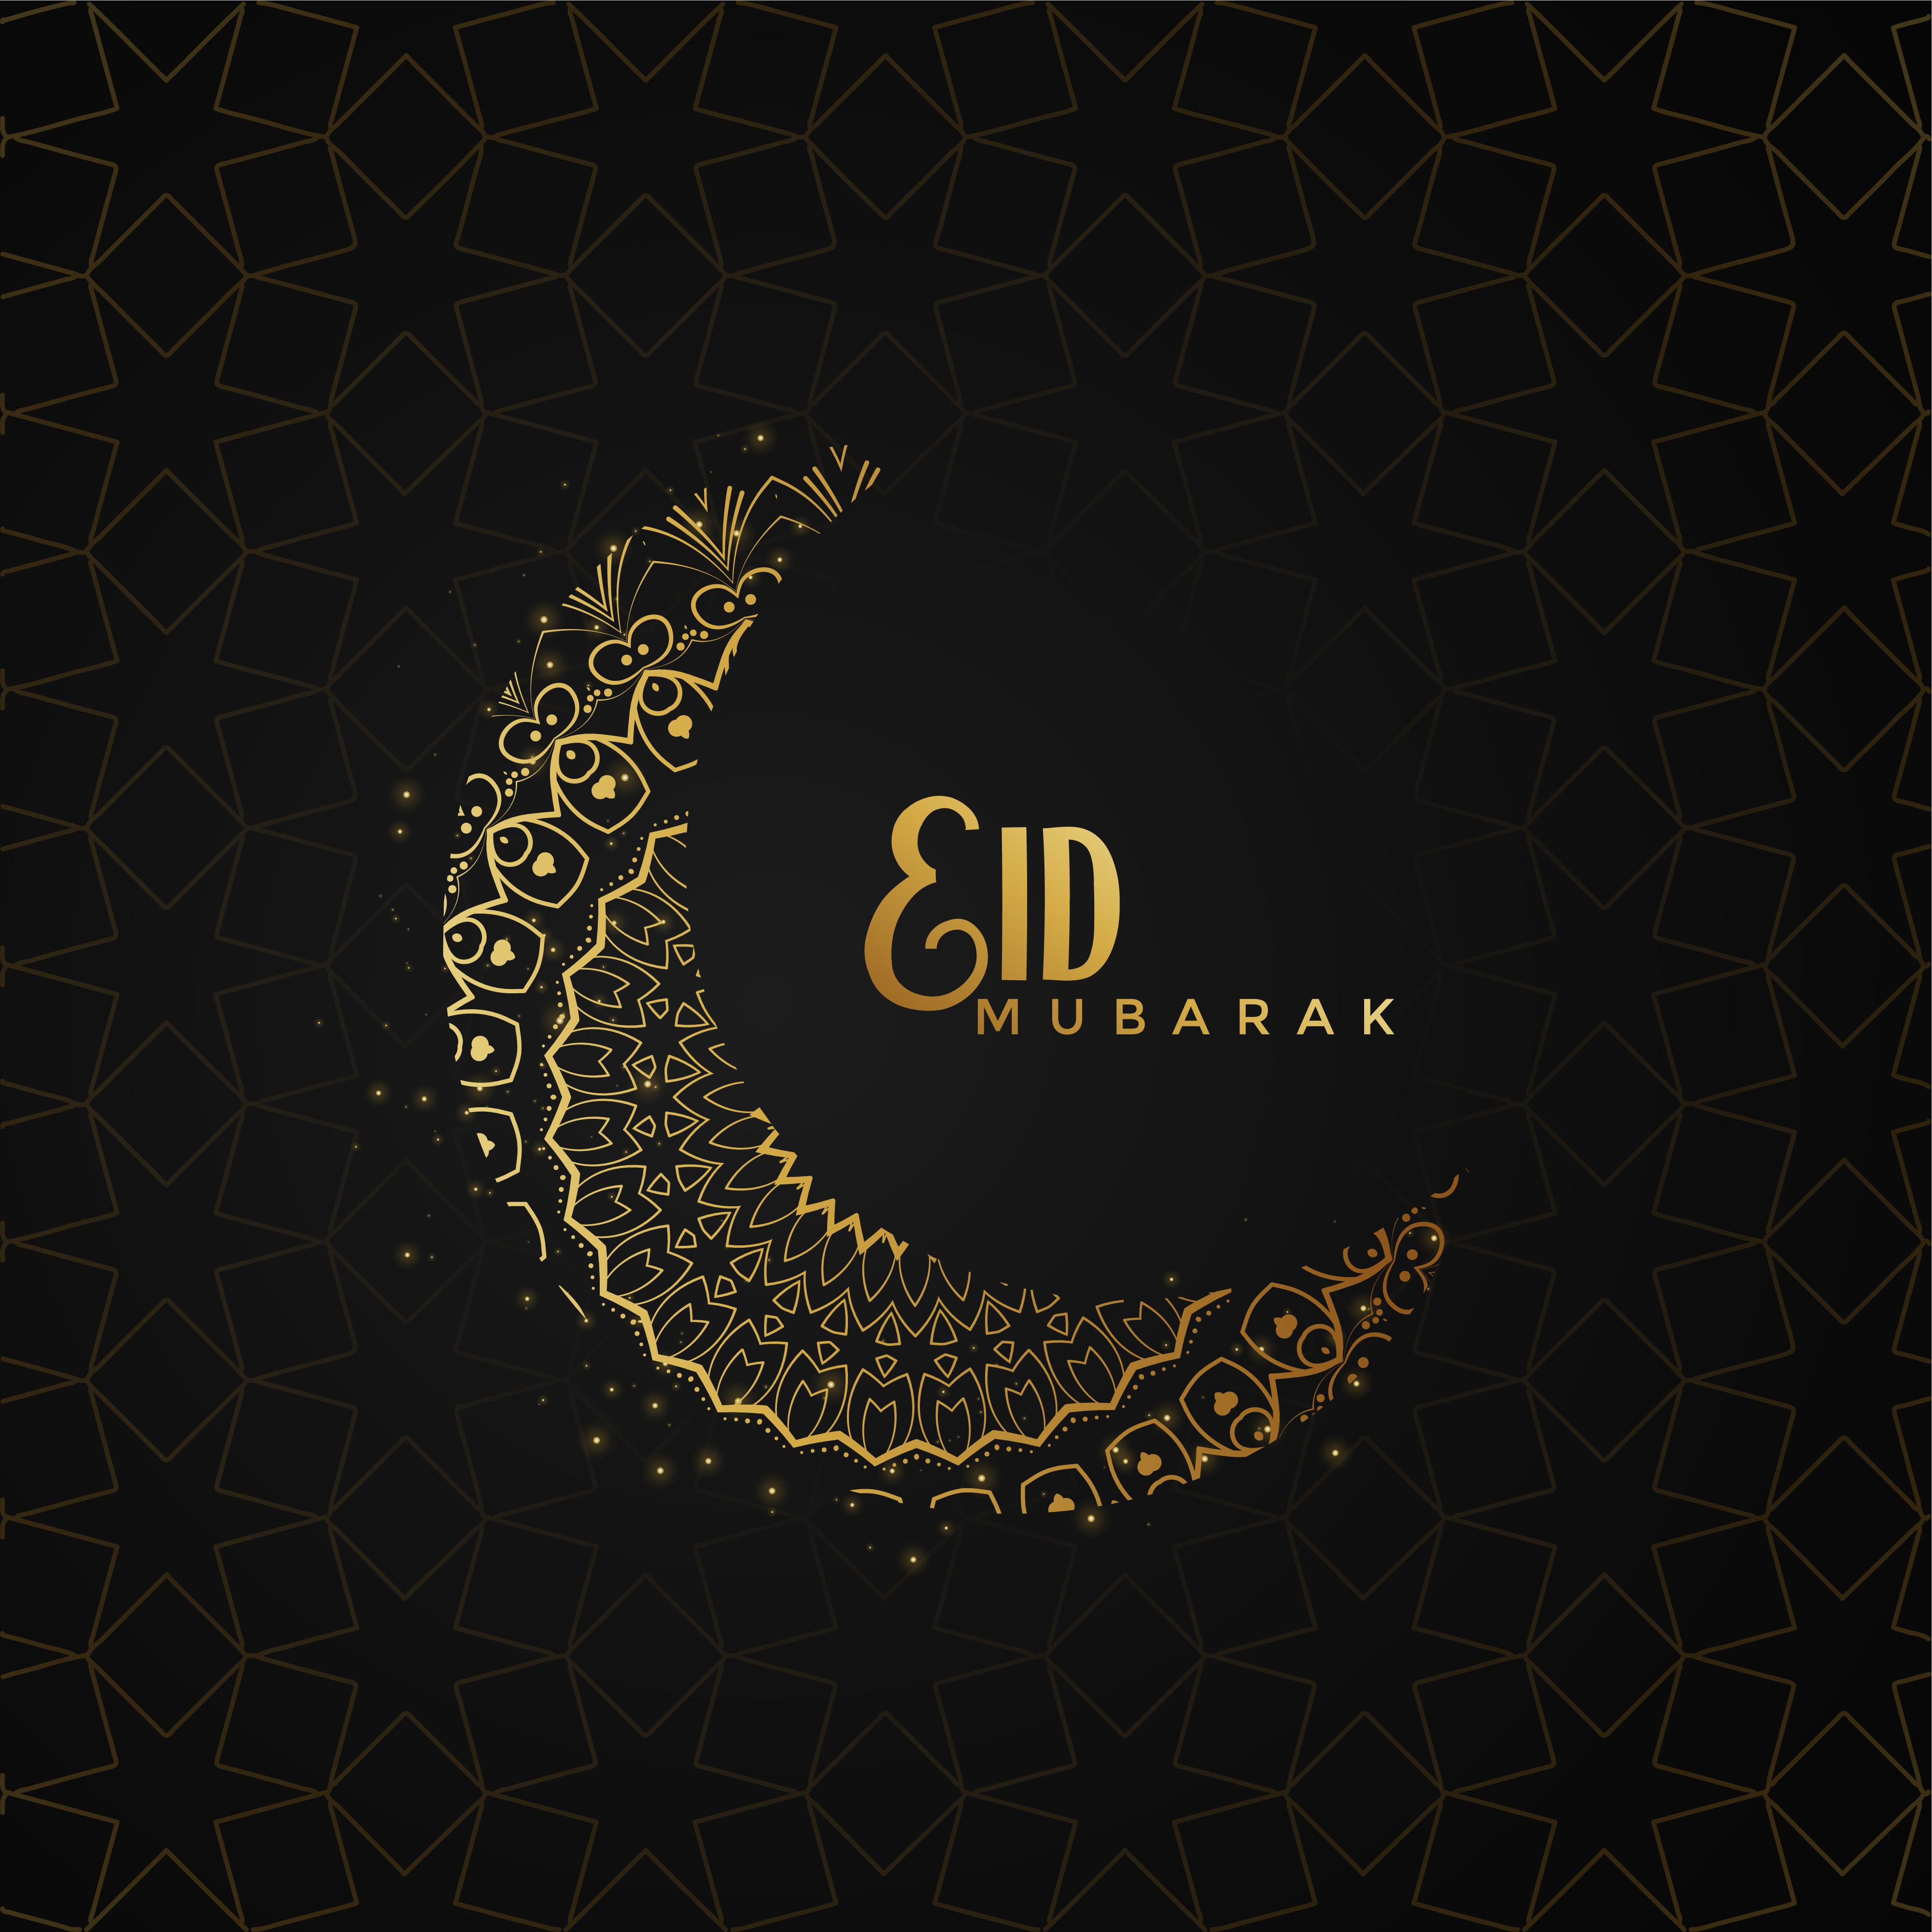 Eid Mubarak Greeting Design With Creative Moon Download Free